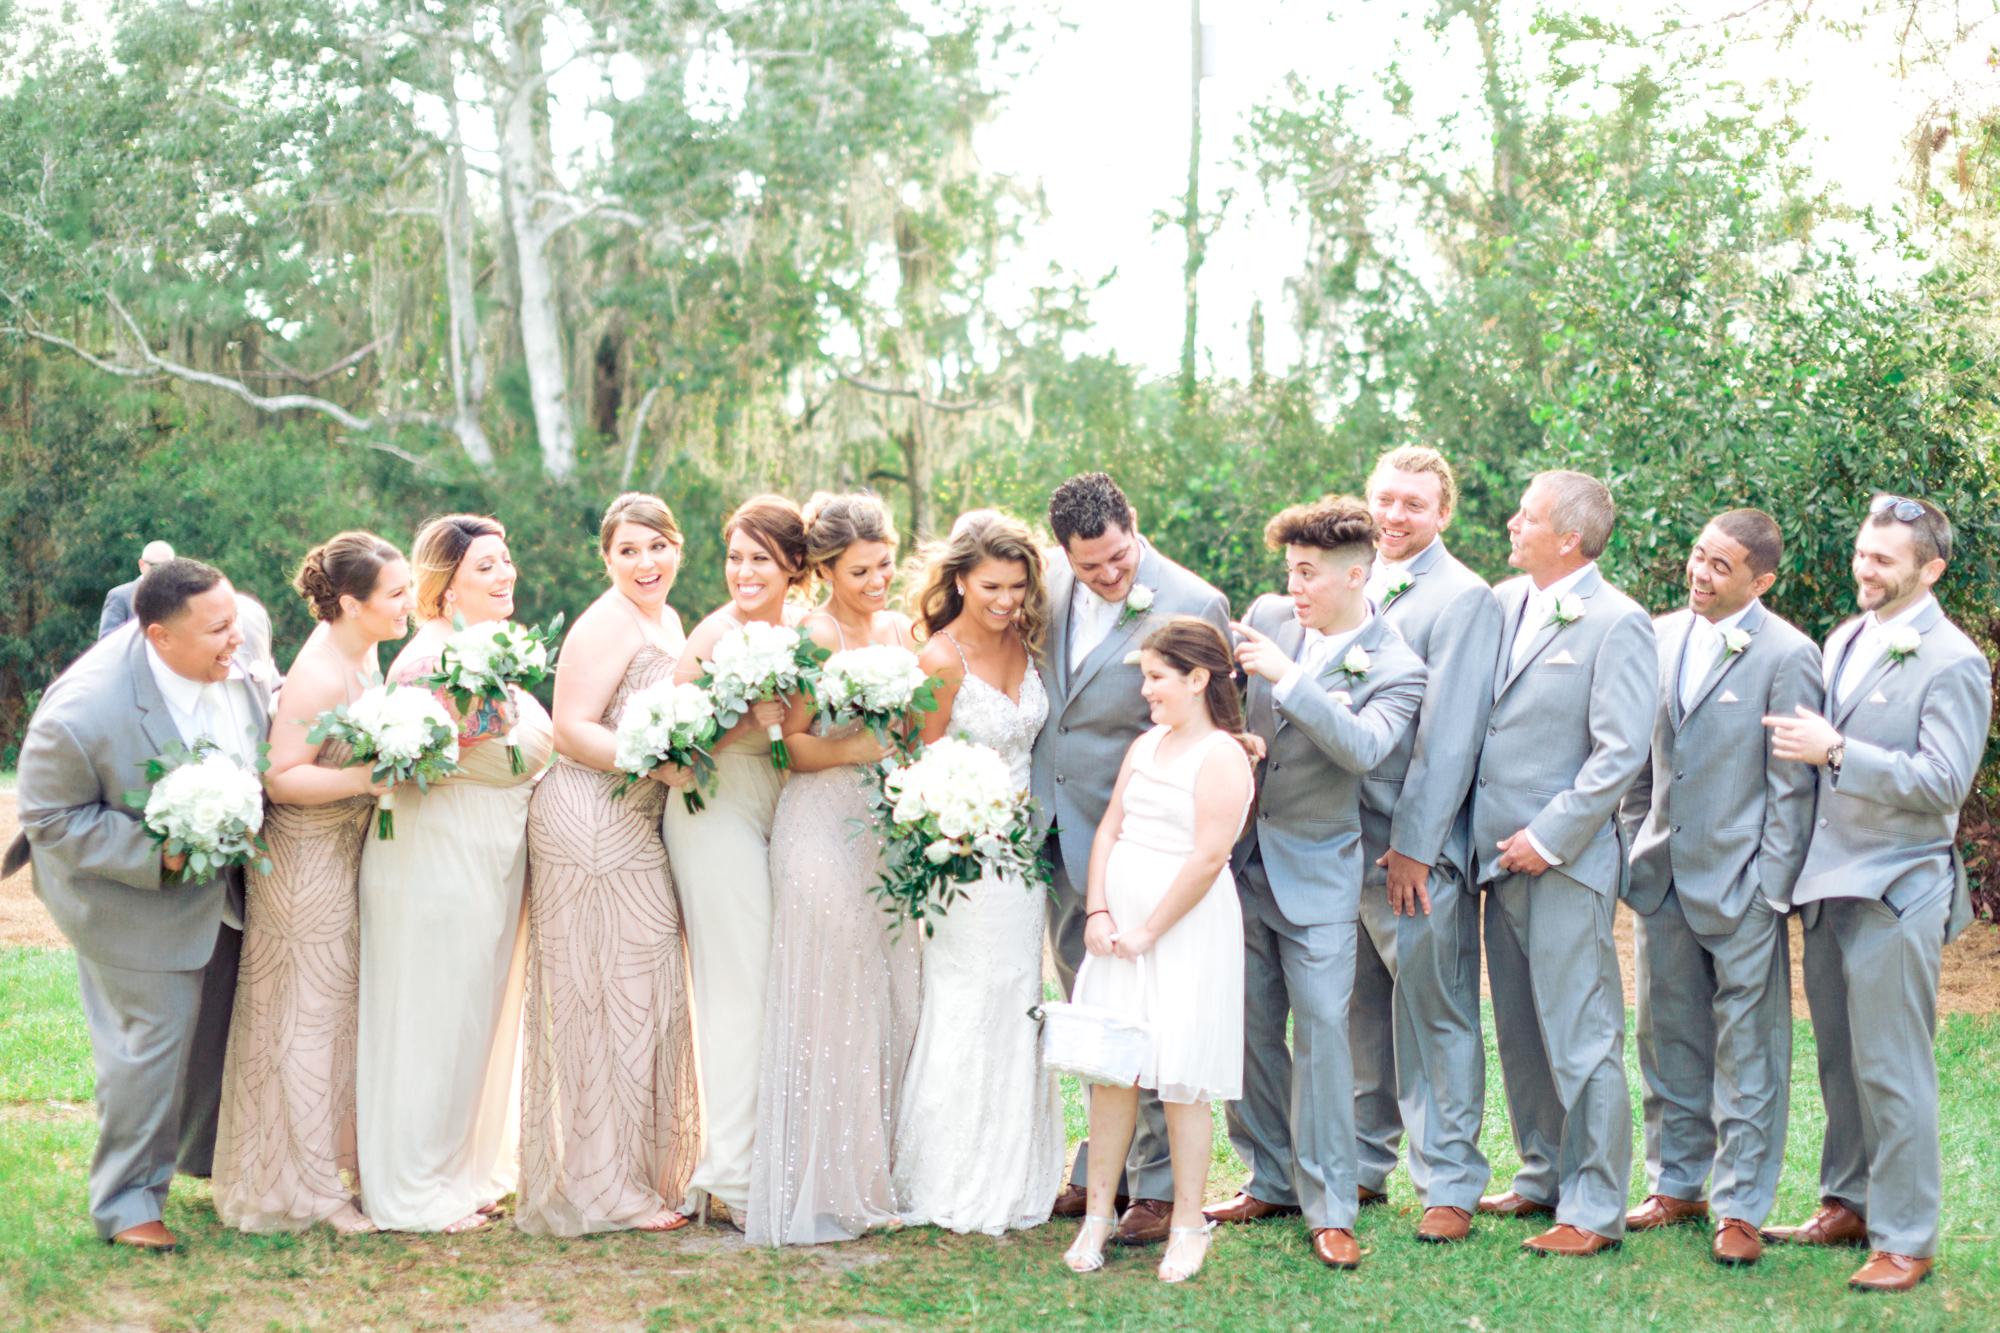 jessica-bellinger-photography-harmony-golf-preserve-wedding-photos-9221.jpg